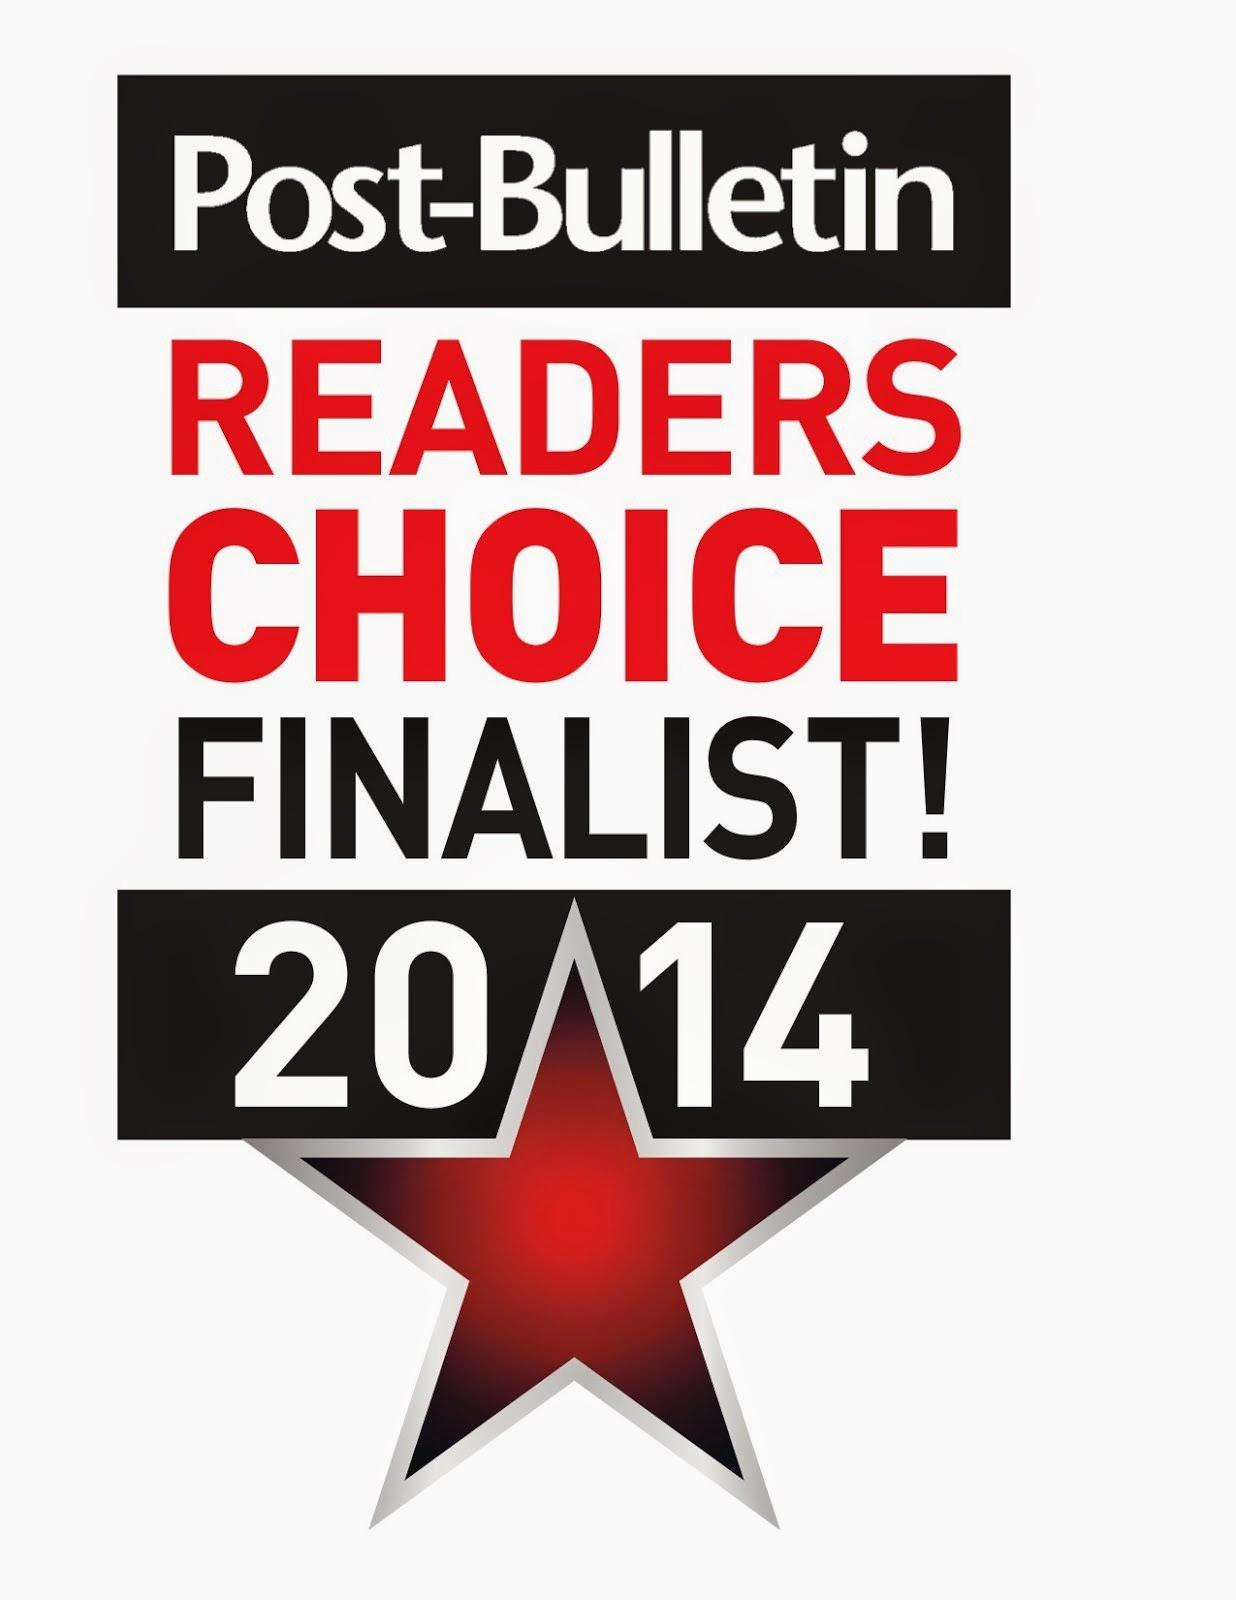 2014 Readers Choice Award!